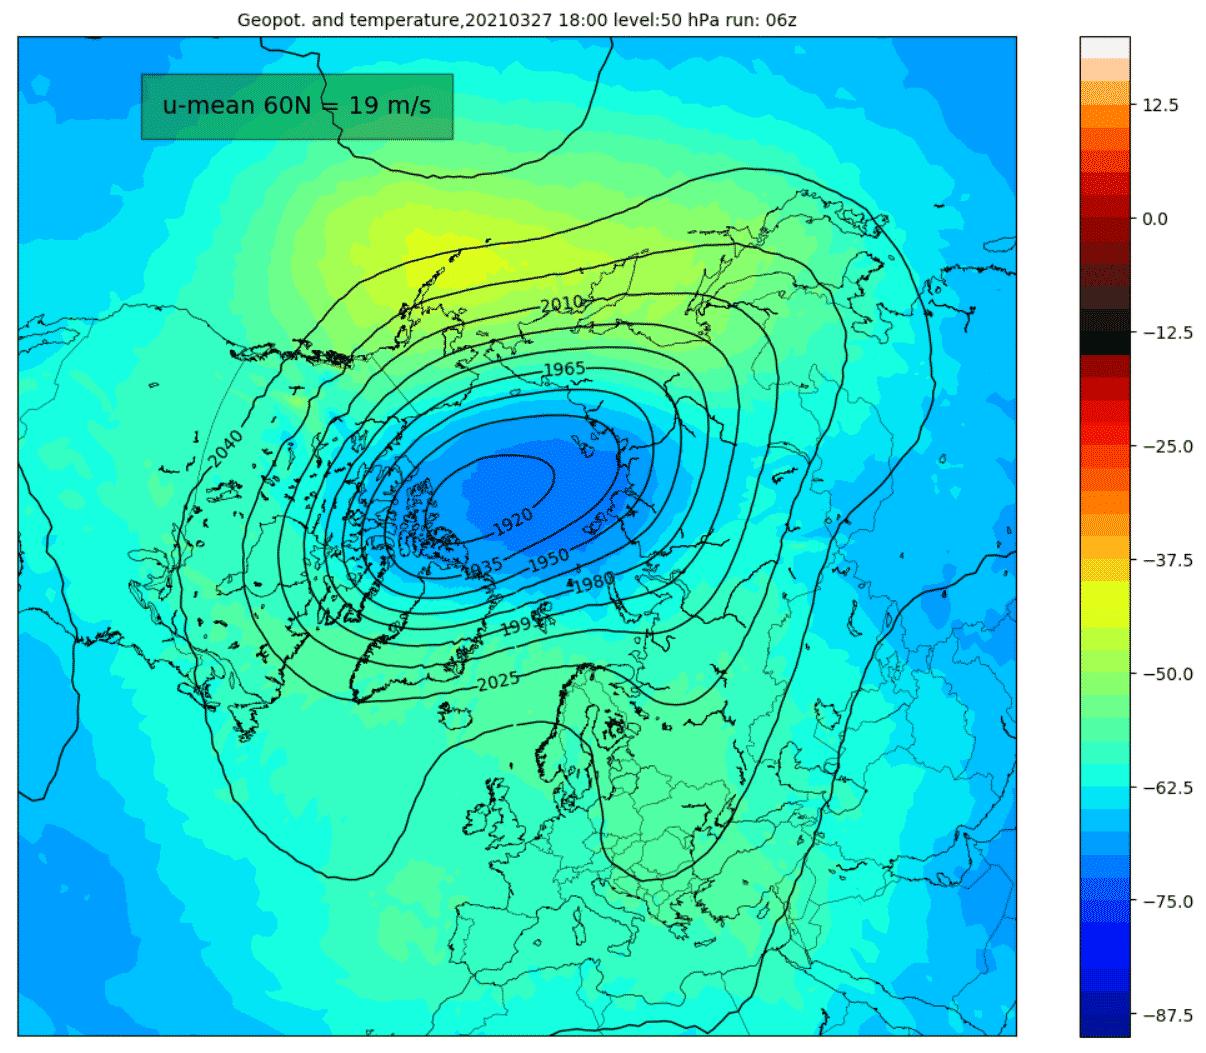 weather-forecast-march-april-2021-united-states-europe-polar-vortex-20km-stratosphere